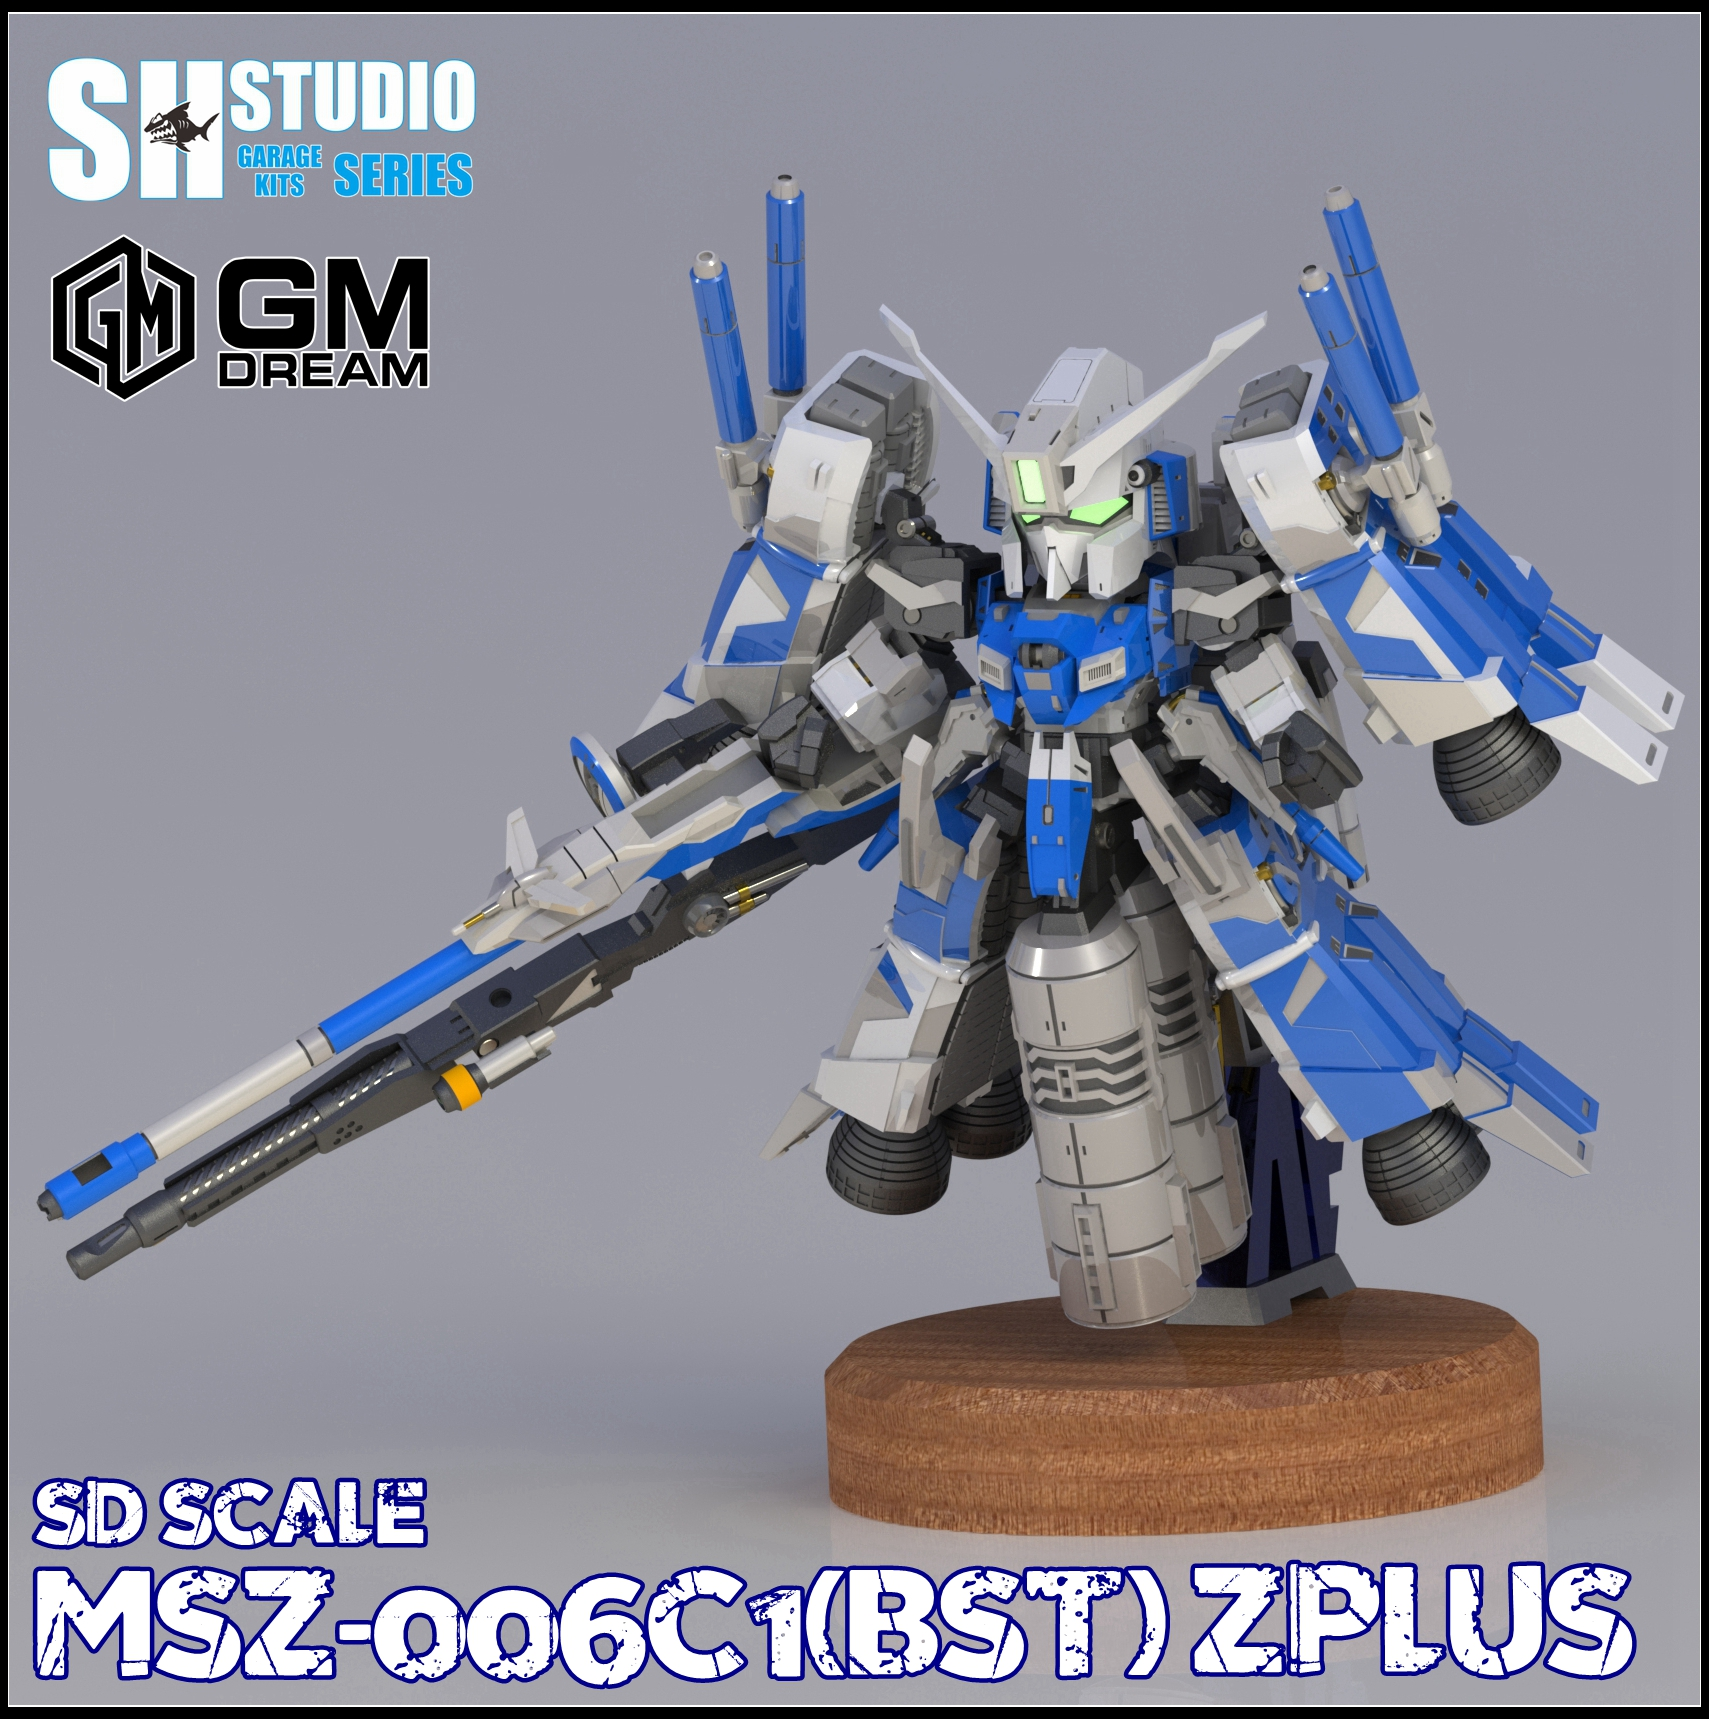 G525_MSZ_006_C1_Bst_001.jpg